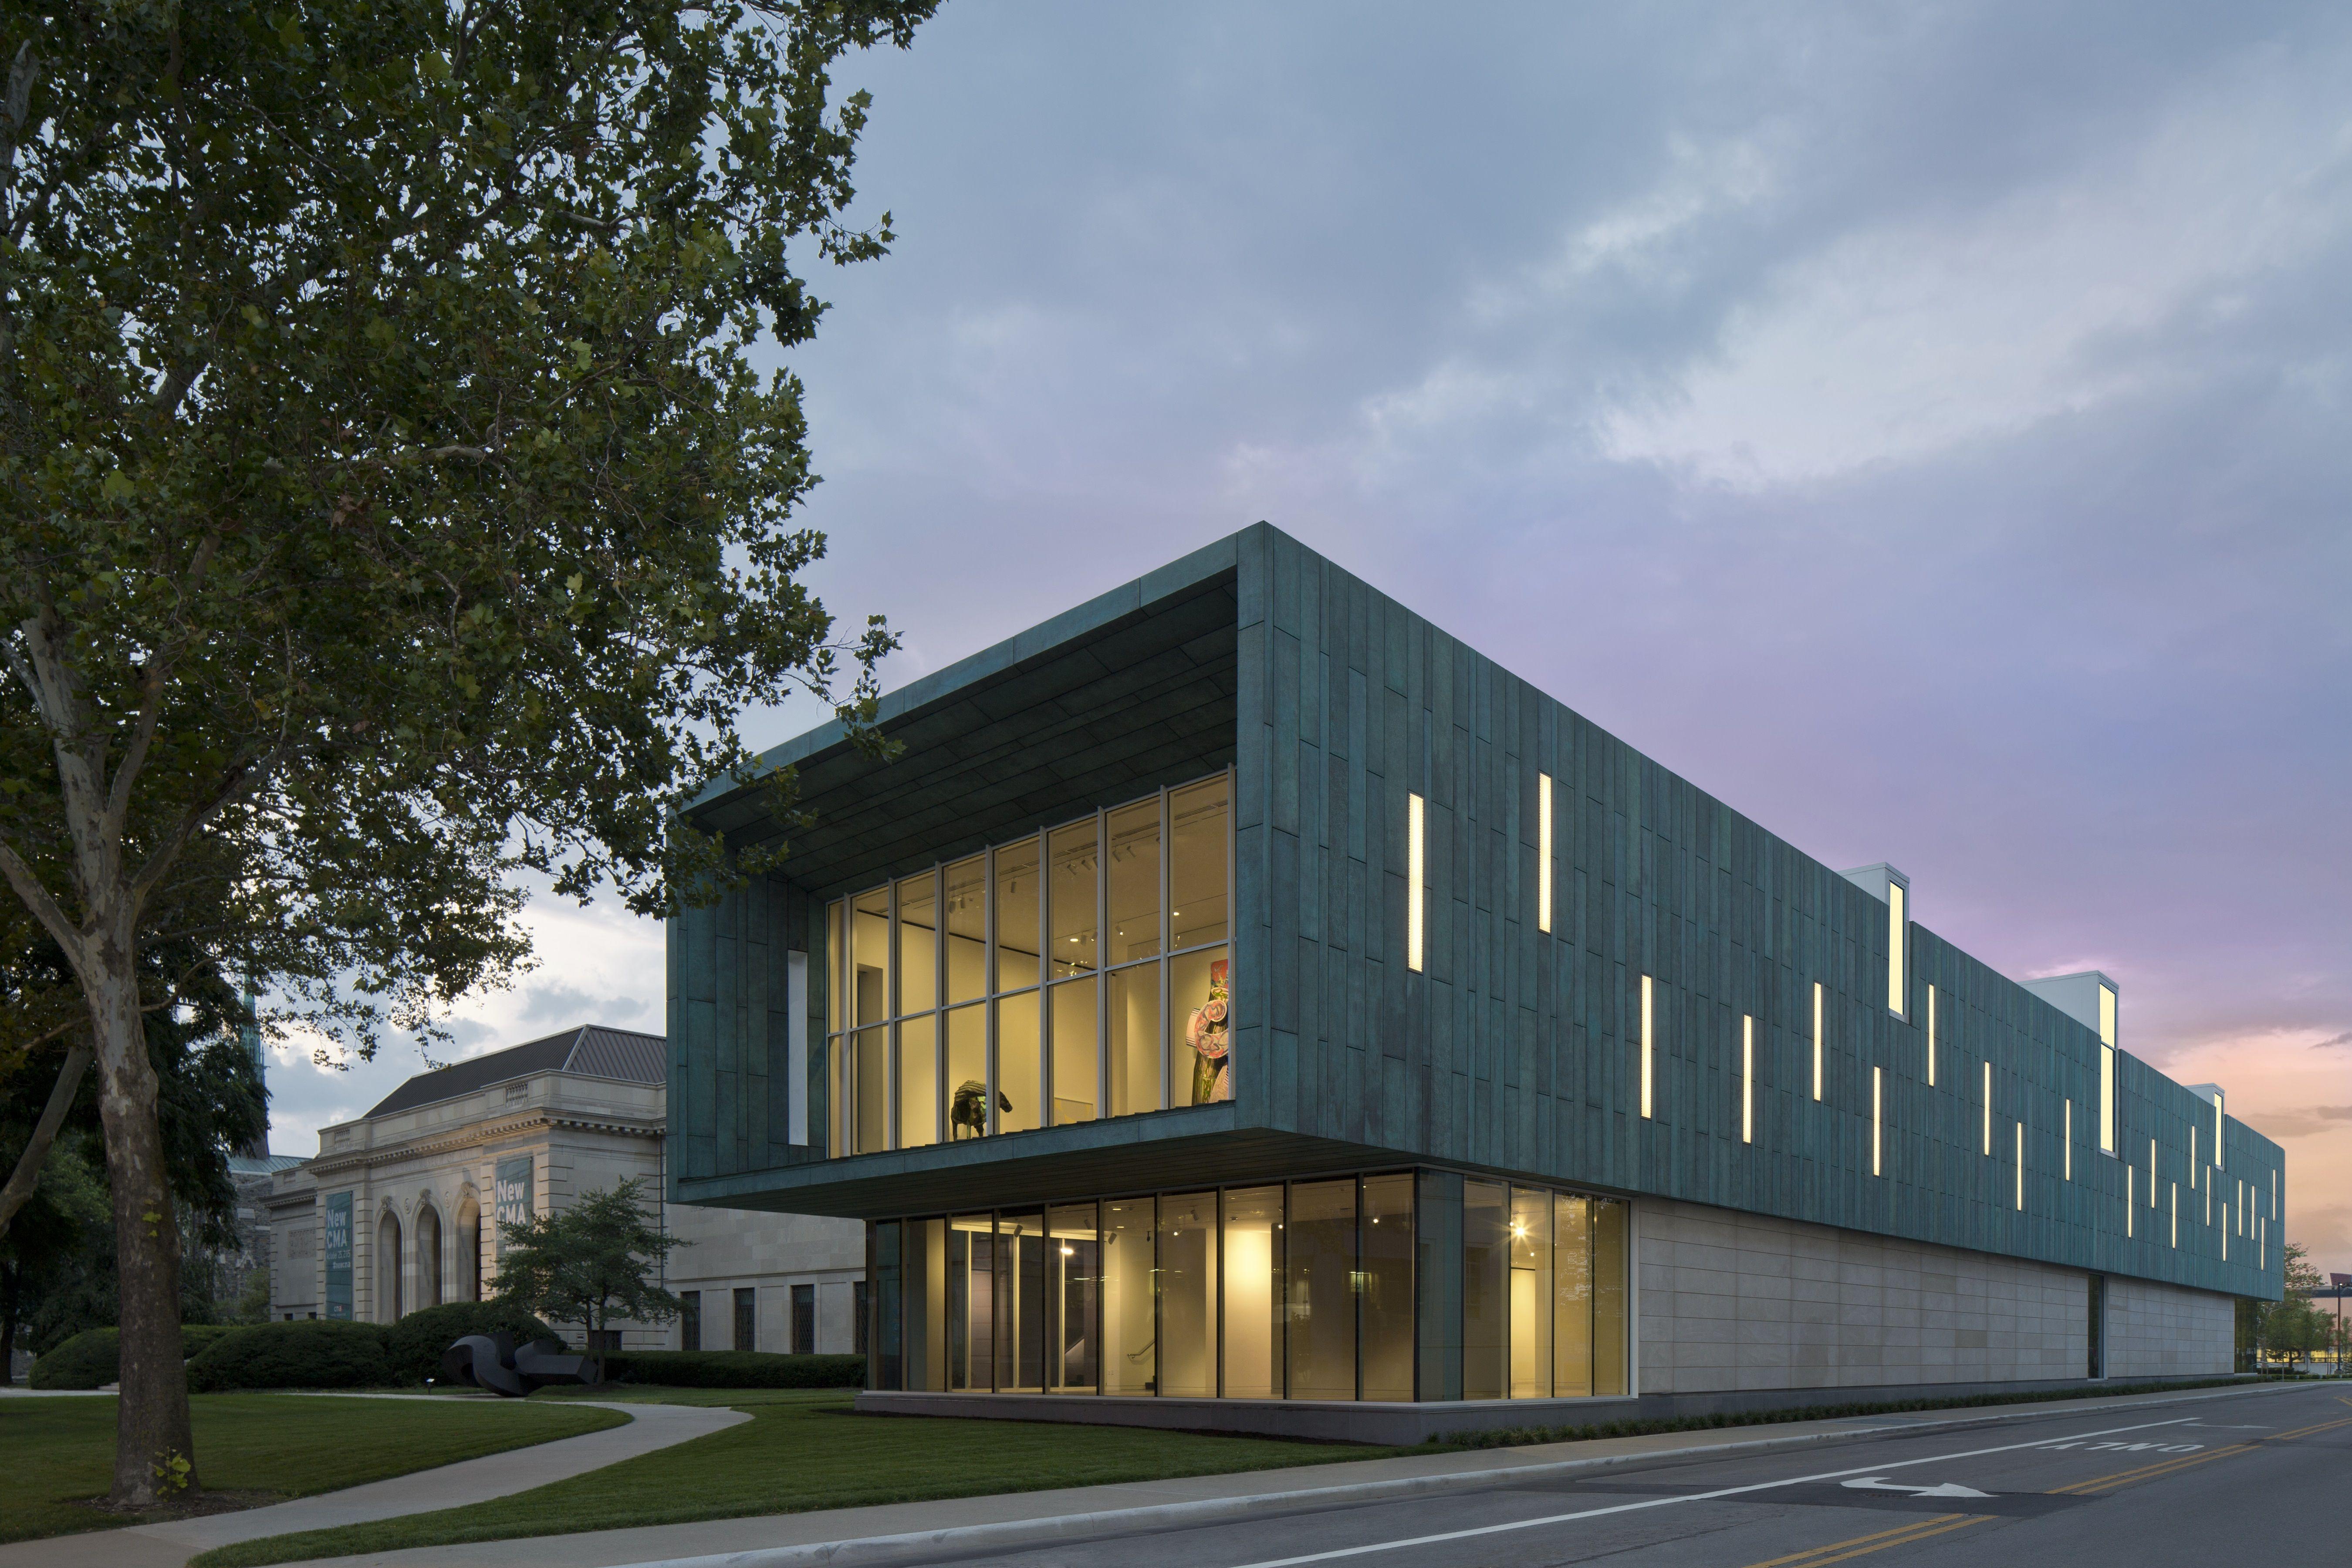 Gallery of Saint Apollinaire Multipurpose Center Parka 5